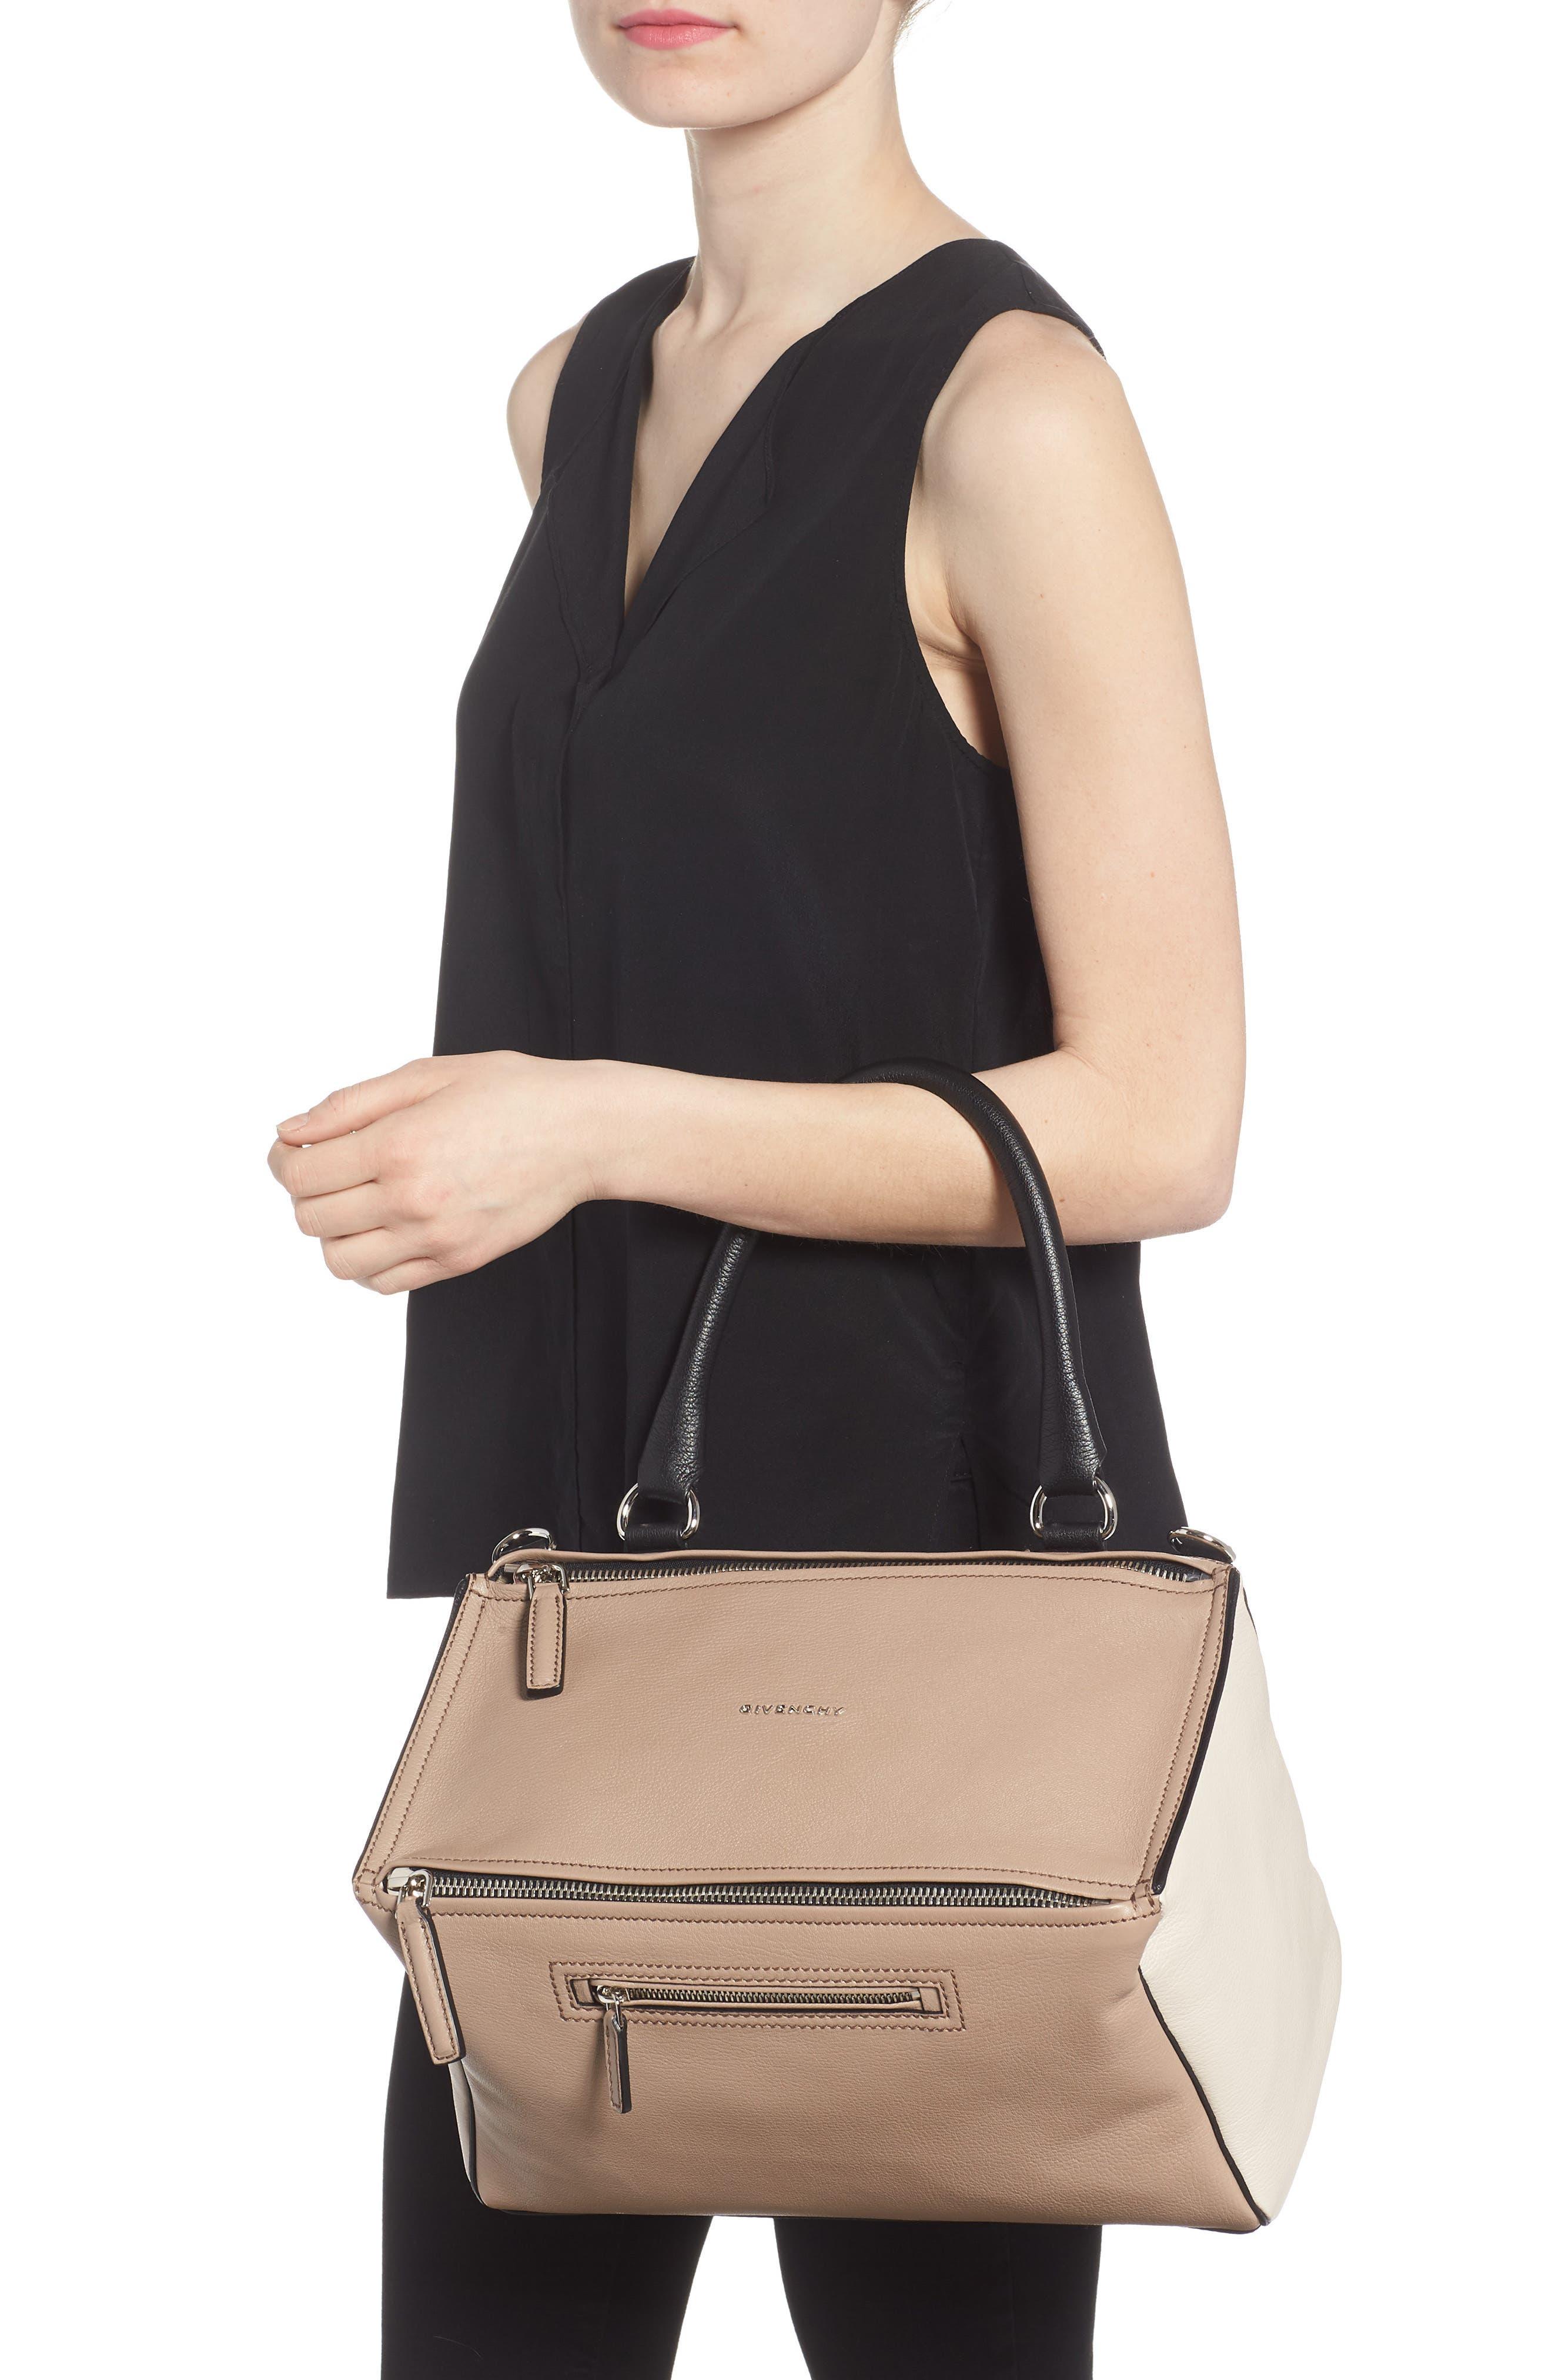 Medium Pandora Box Tricolor Leather Crossbody Bag,                             Alternate thumbnail 2, color,                             Linen